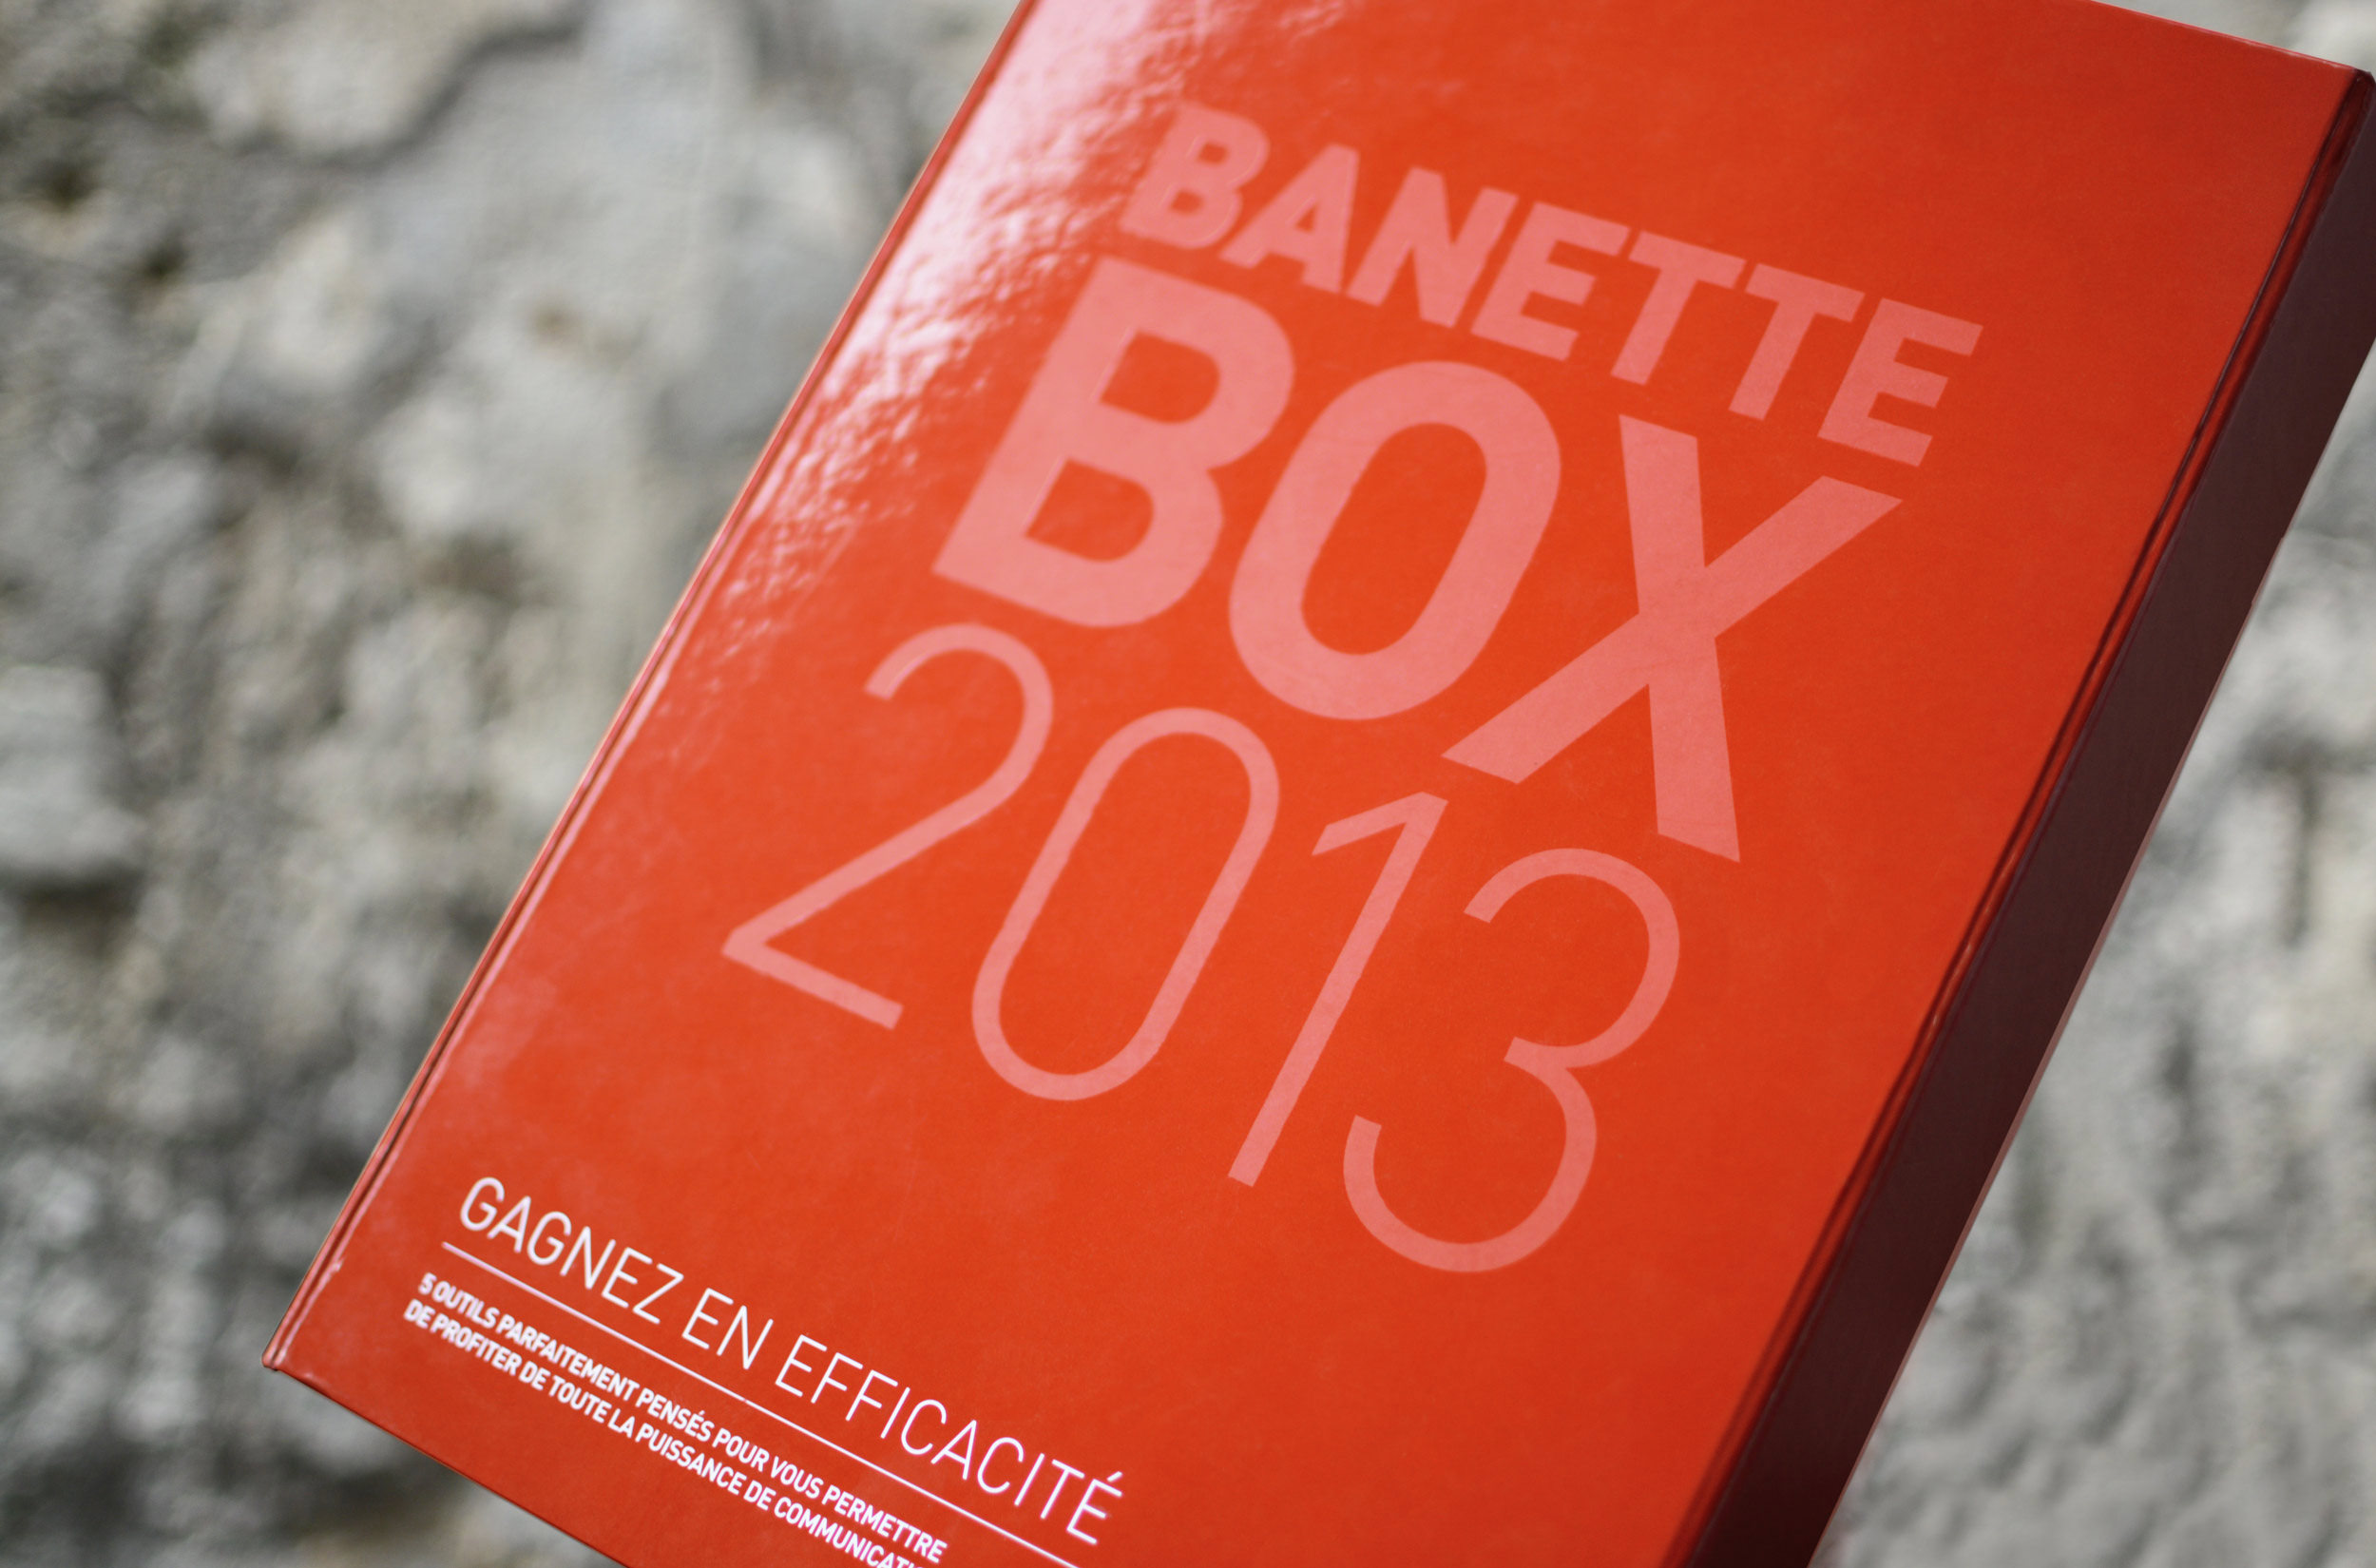 Banette Box - 1